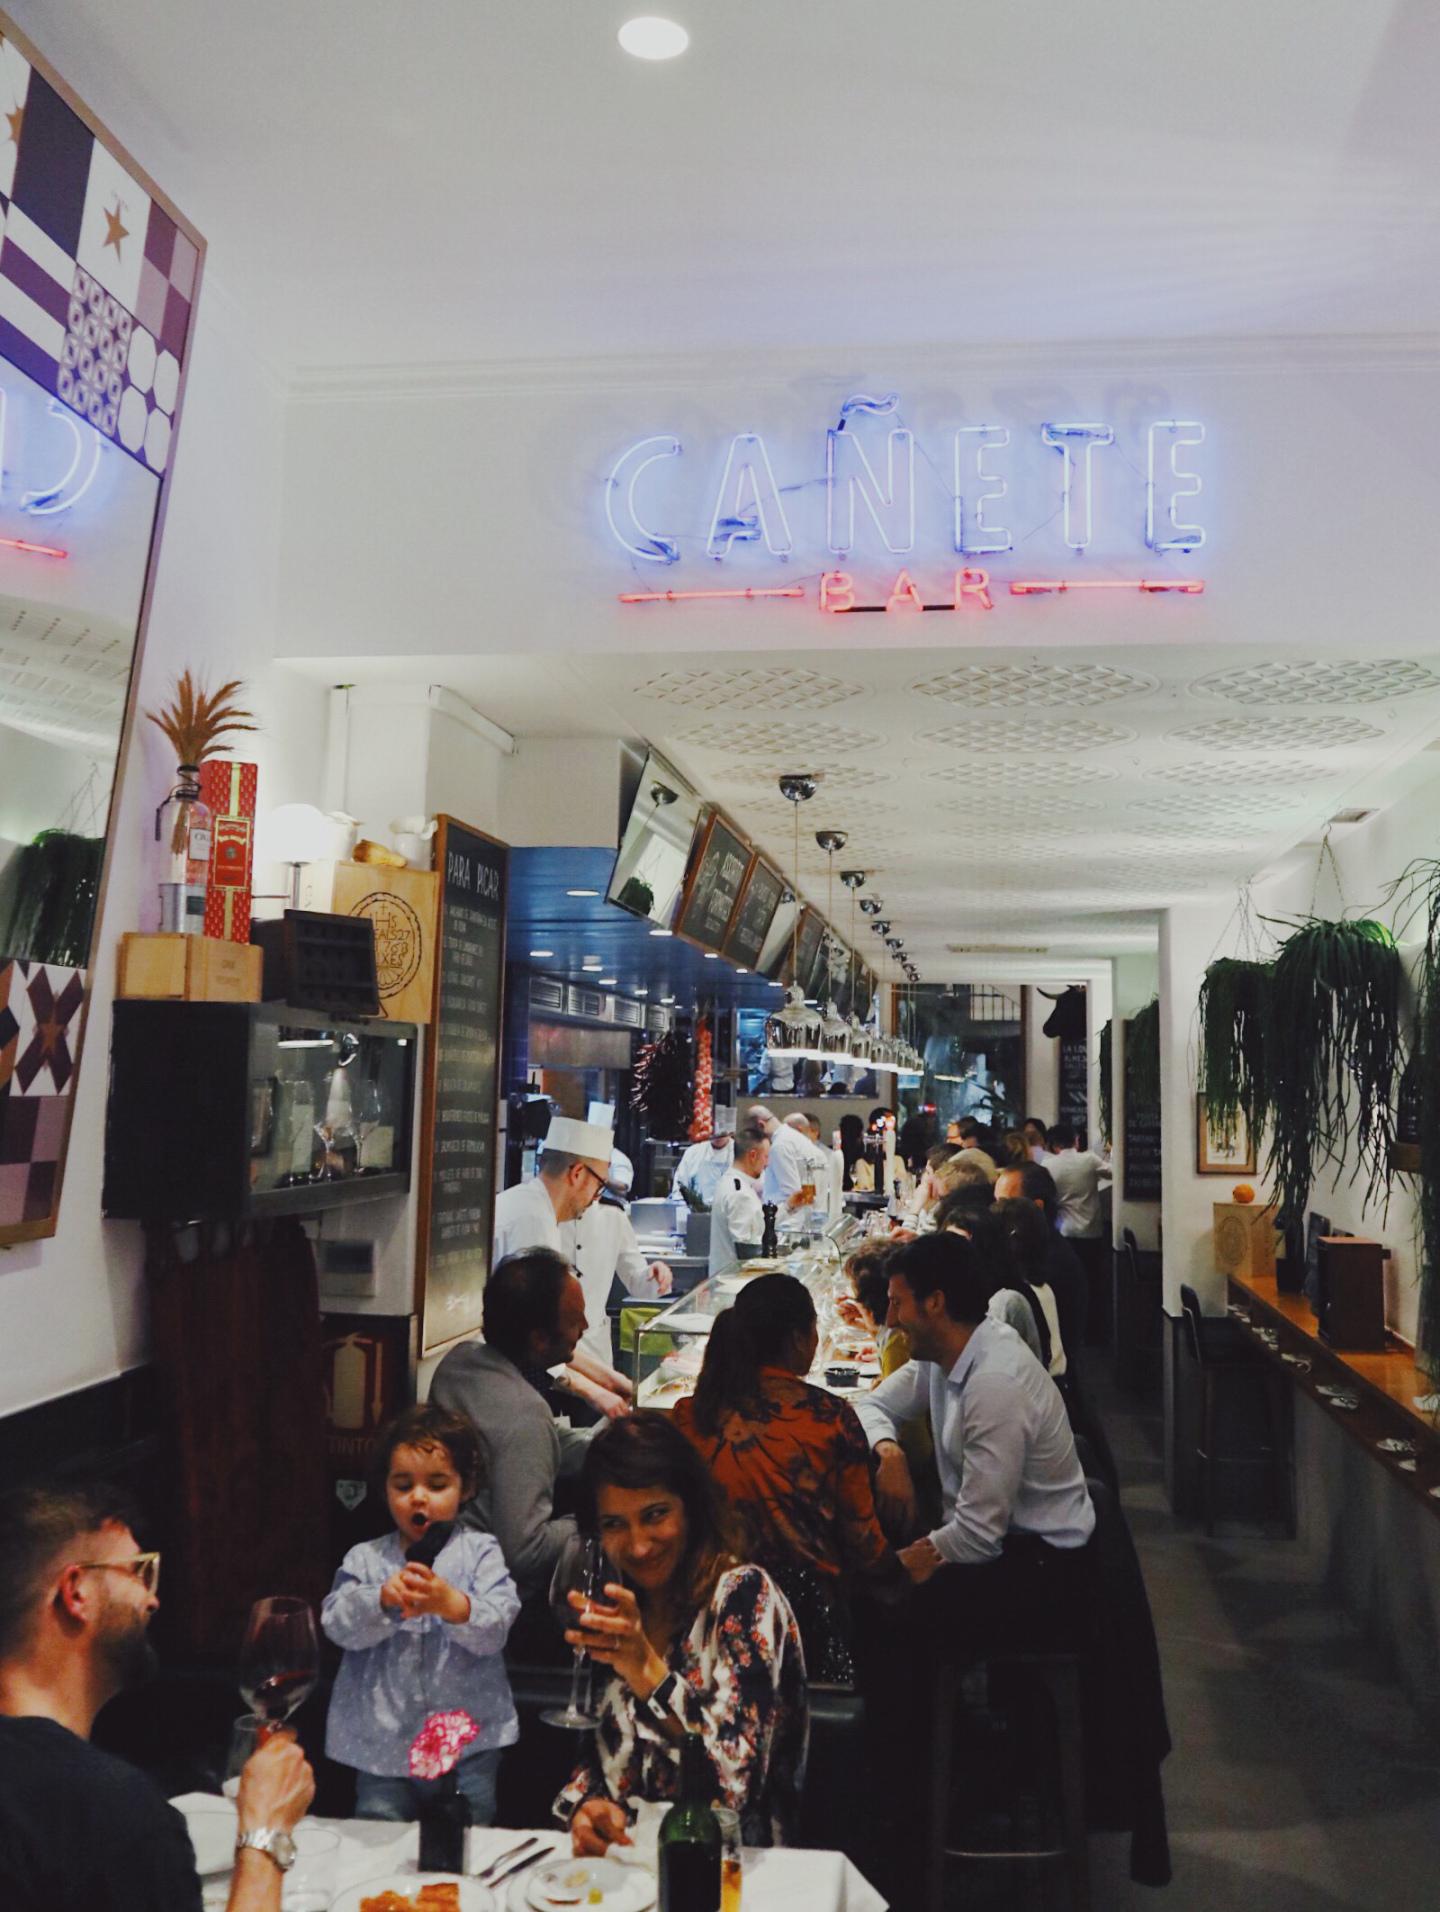 Bar Canete Barcelona.jpg